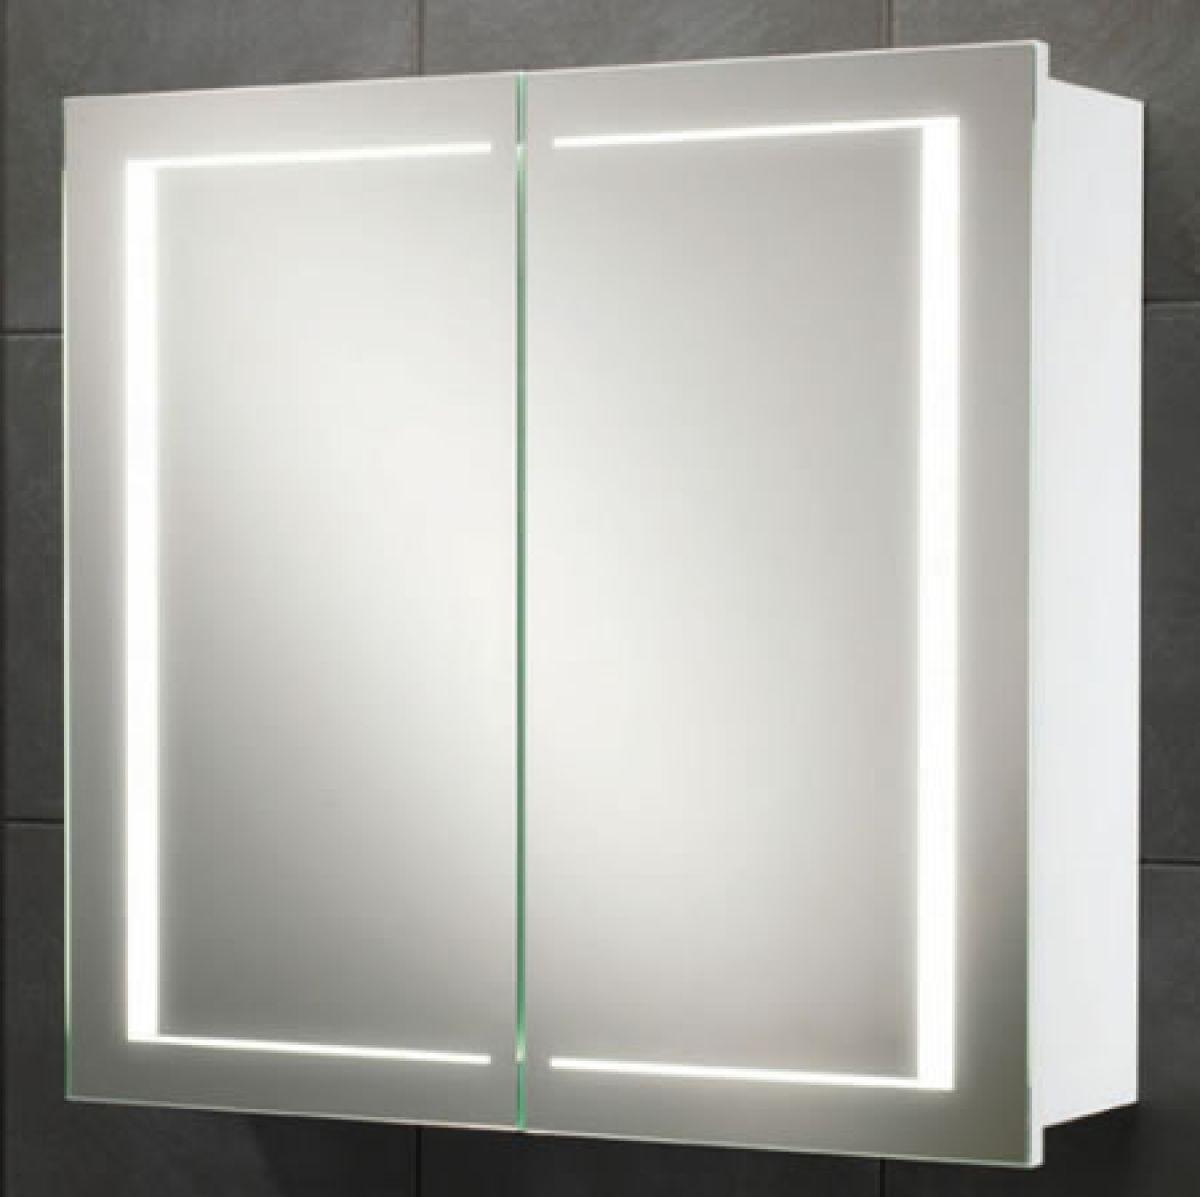 hib colorado led illuminated cabinet uk bathrooms